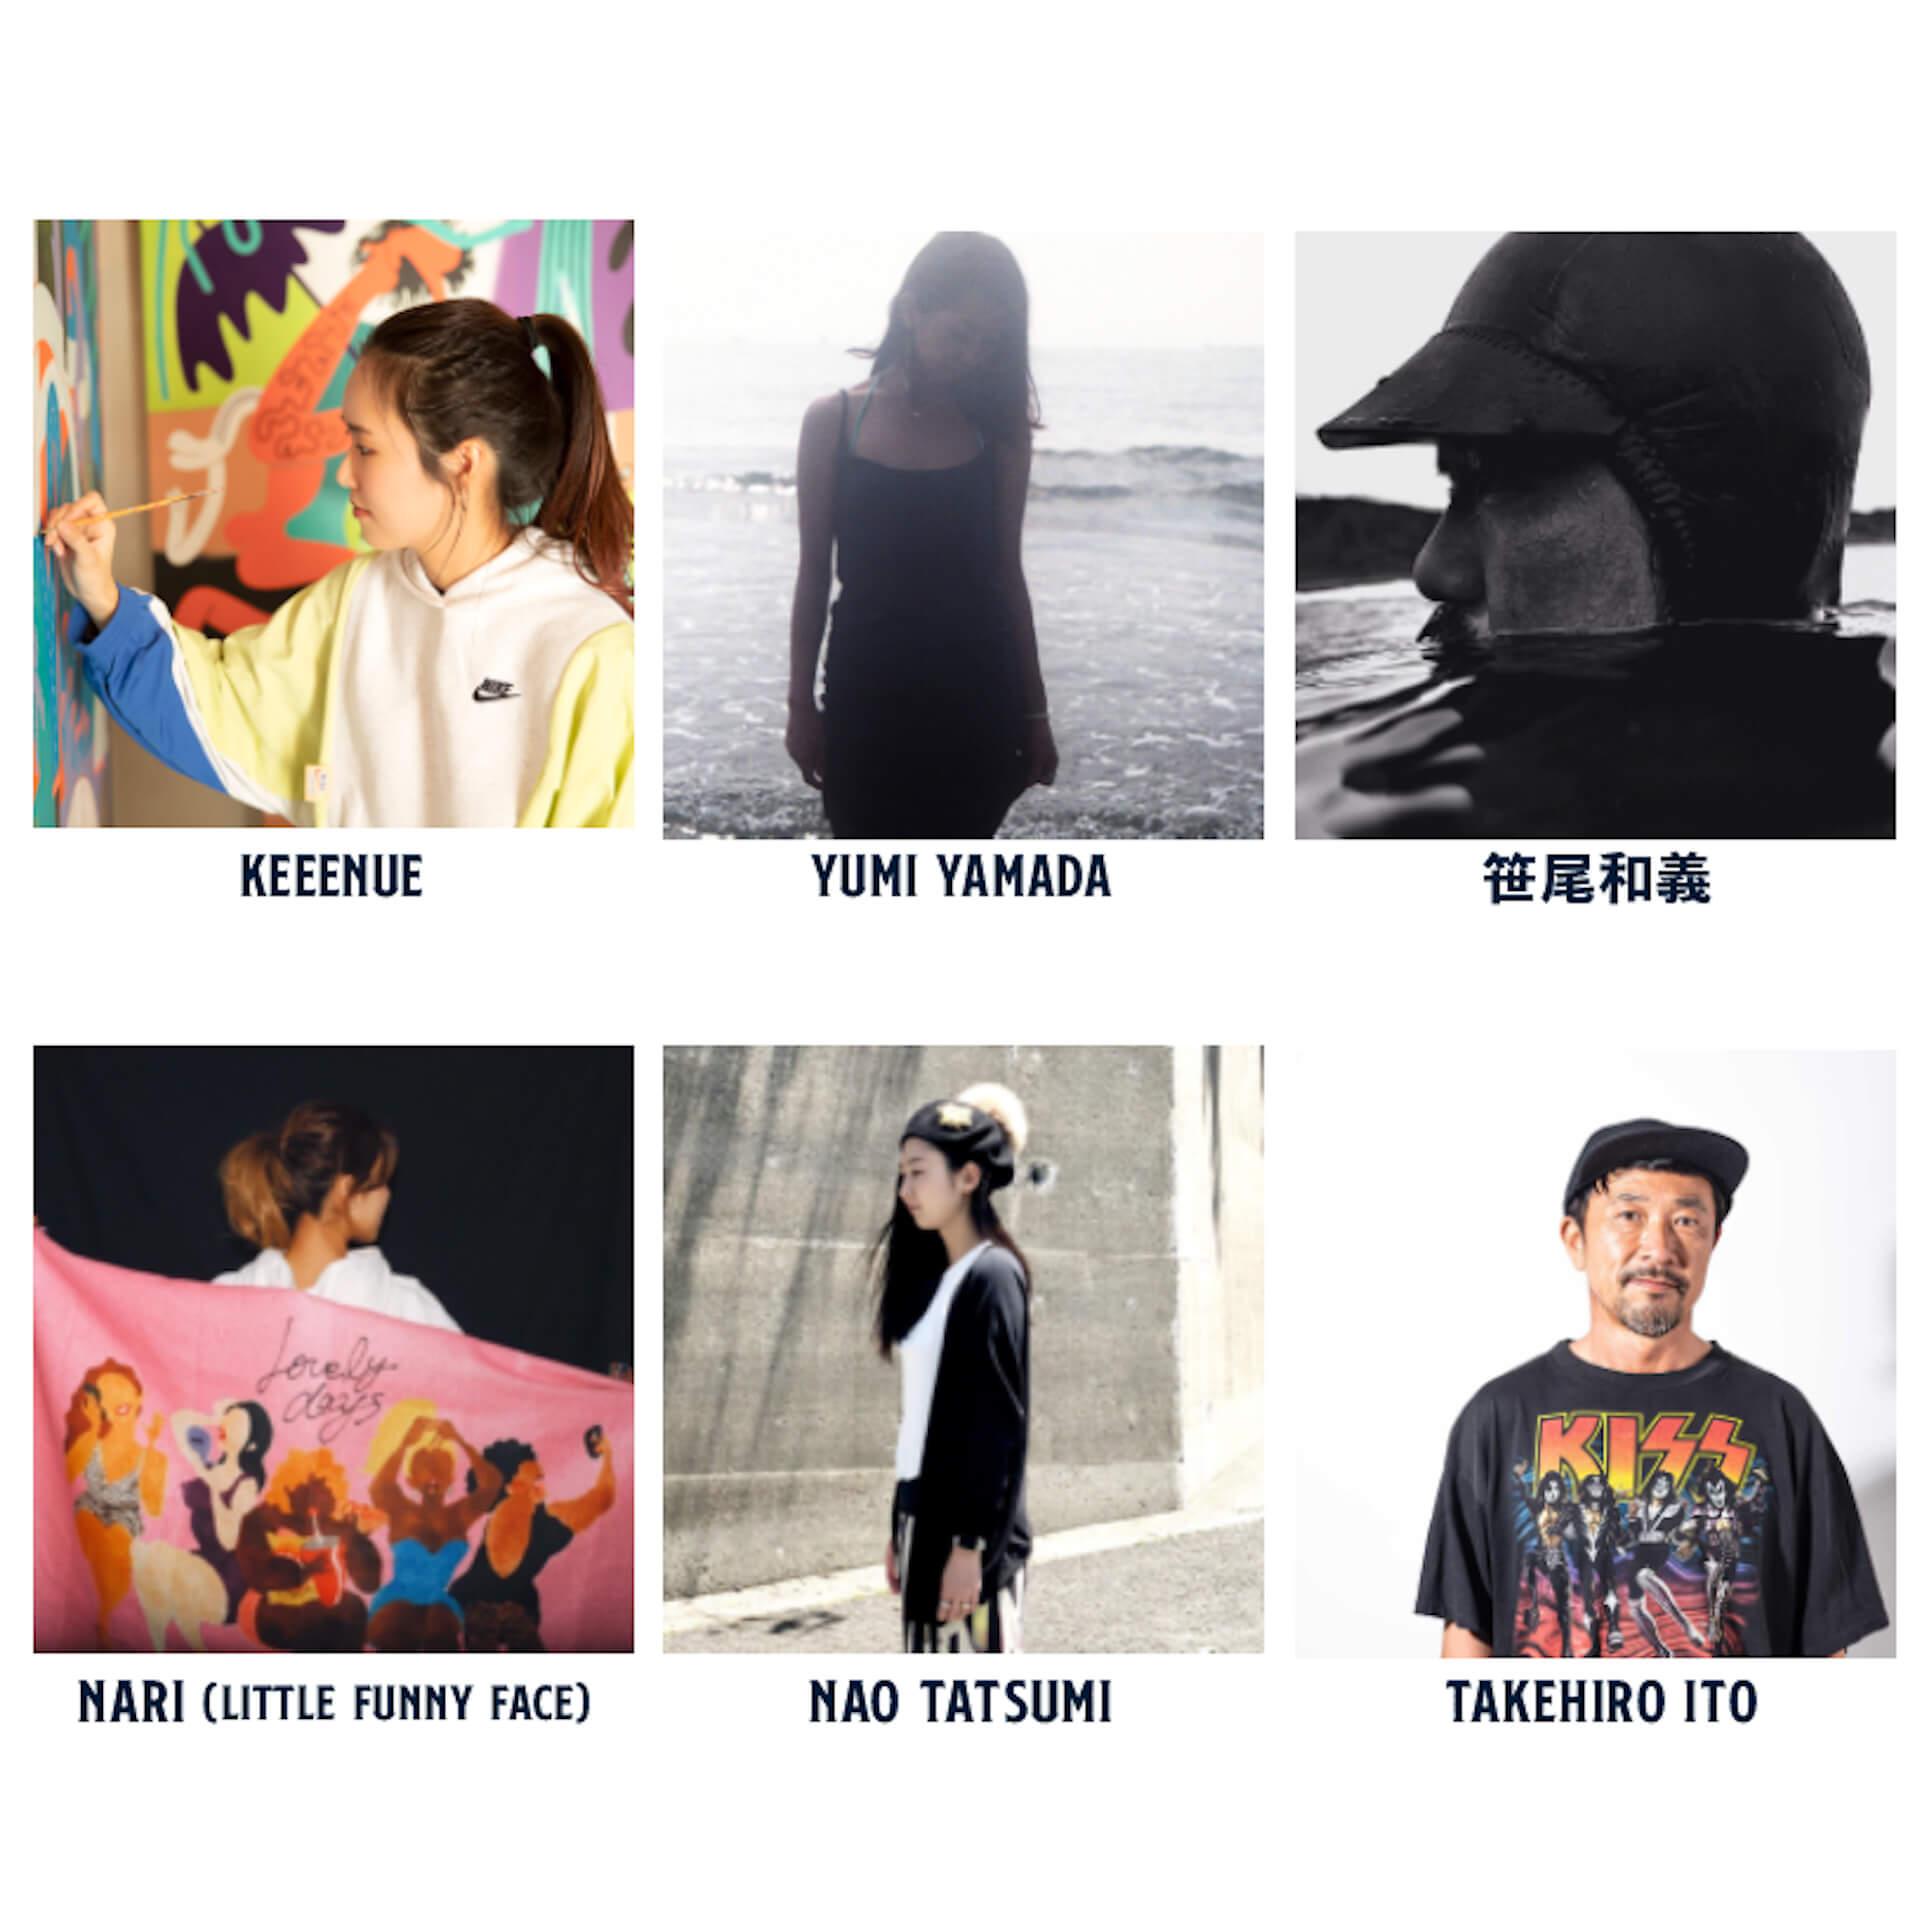 <GREENROOM FESTIVAL'21>ART AREA出展アーティストが発表!Yusuke Hanai、Koji Toyodaら計16組 music210413_greenroomfestival-210413_4